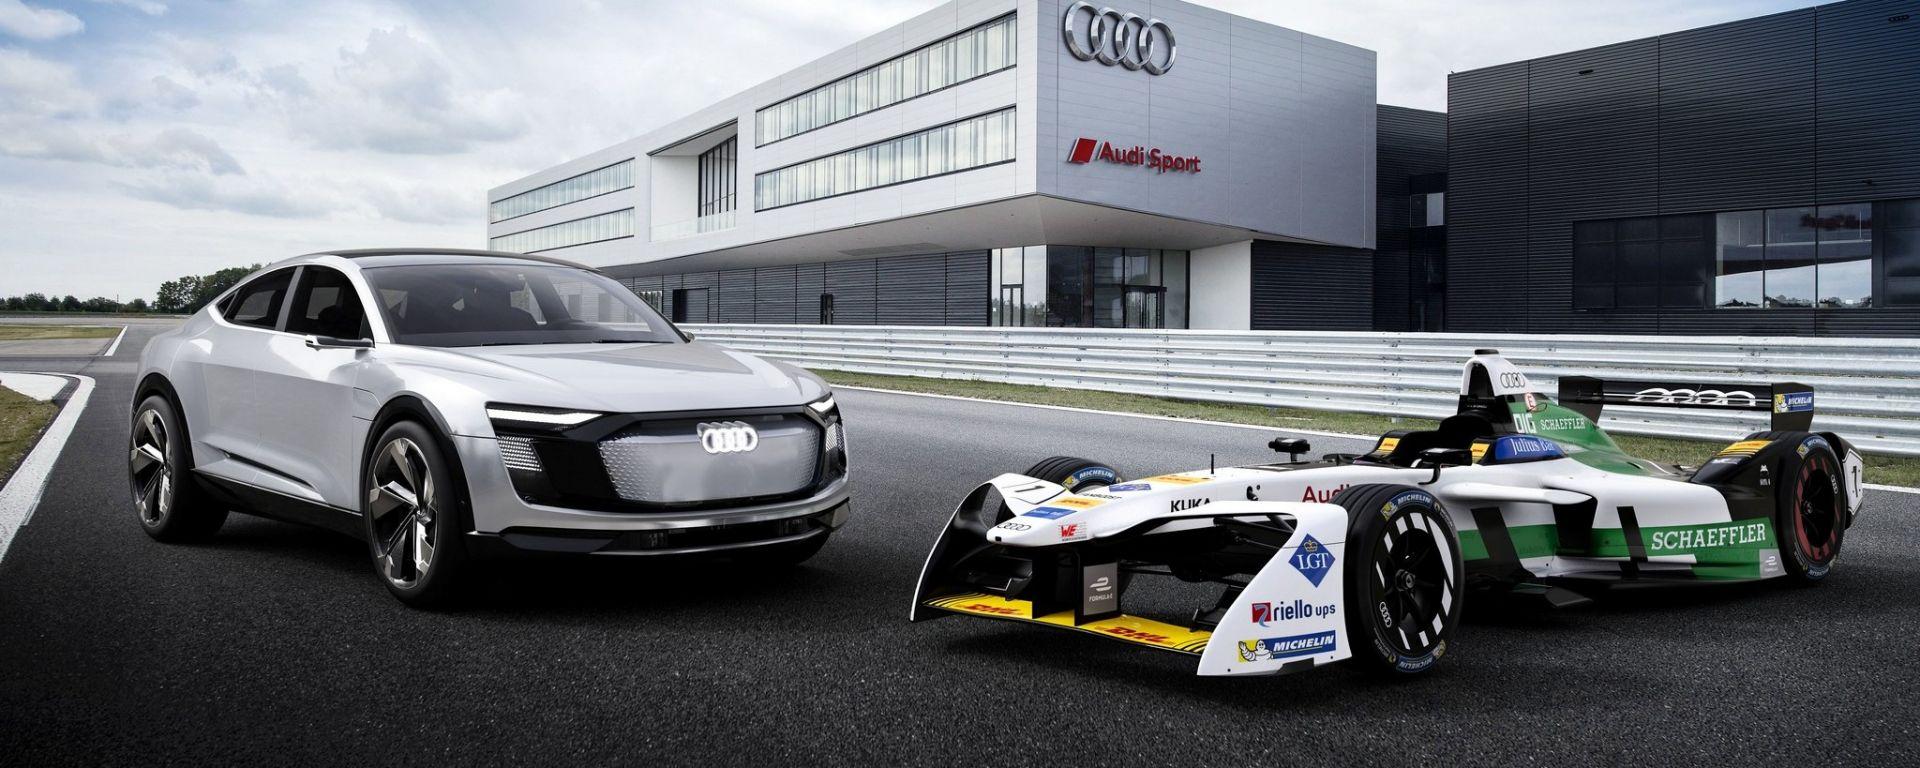 Audi ABT Formula E e la Audi e-tron